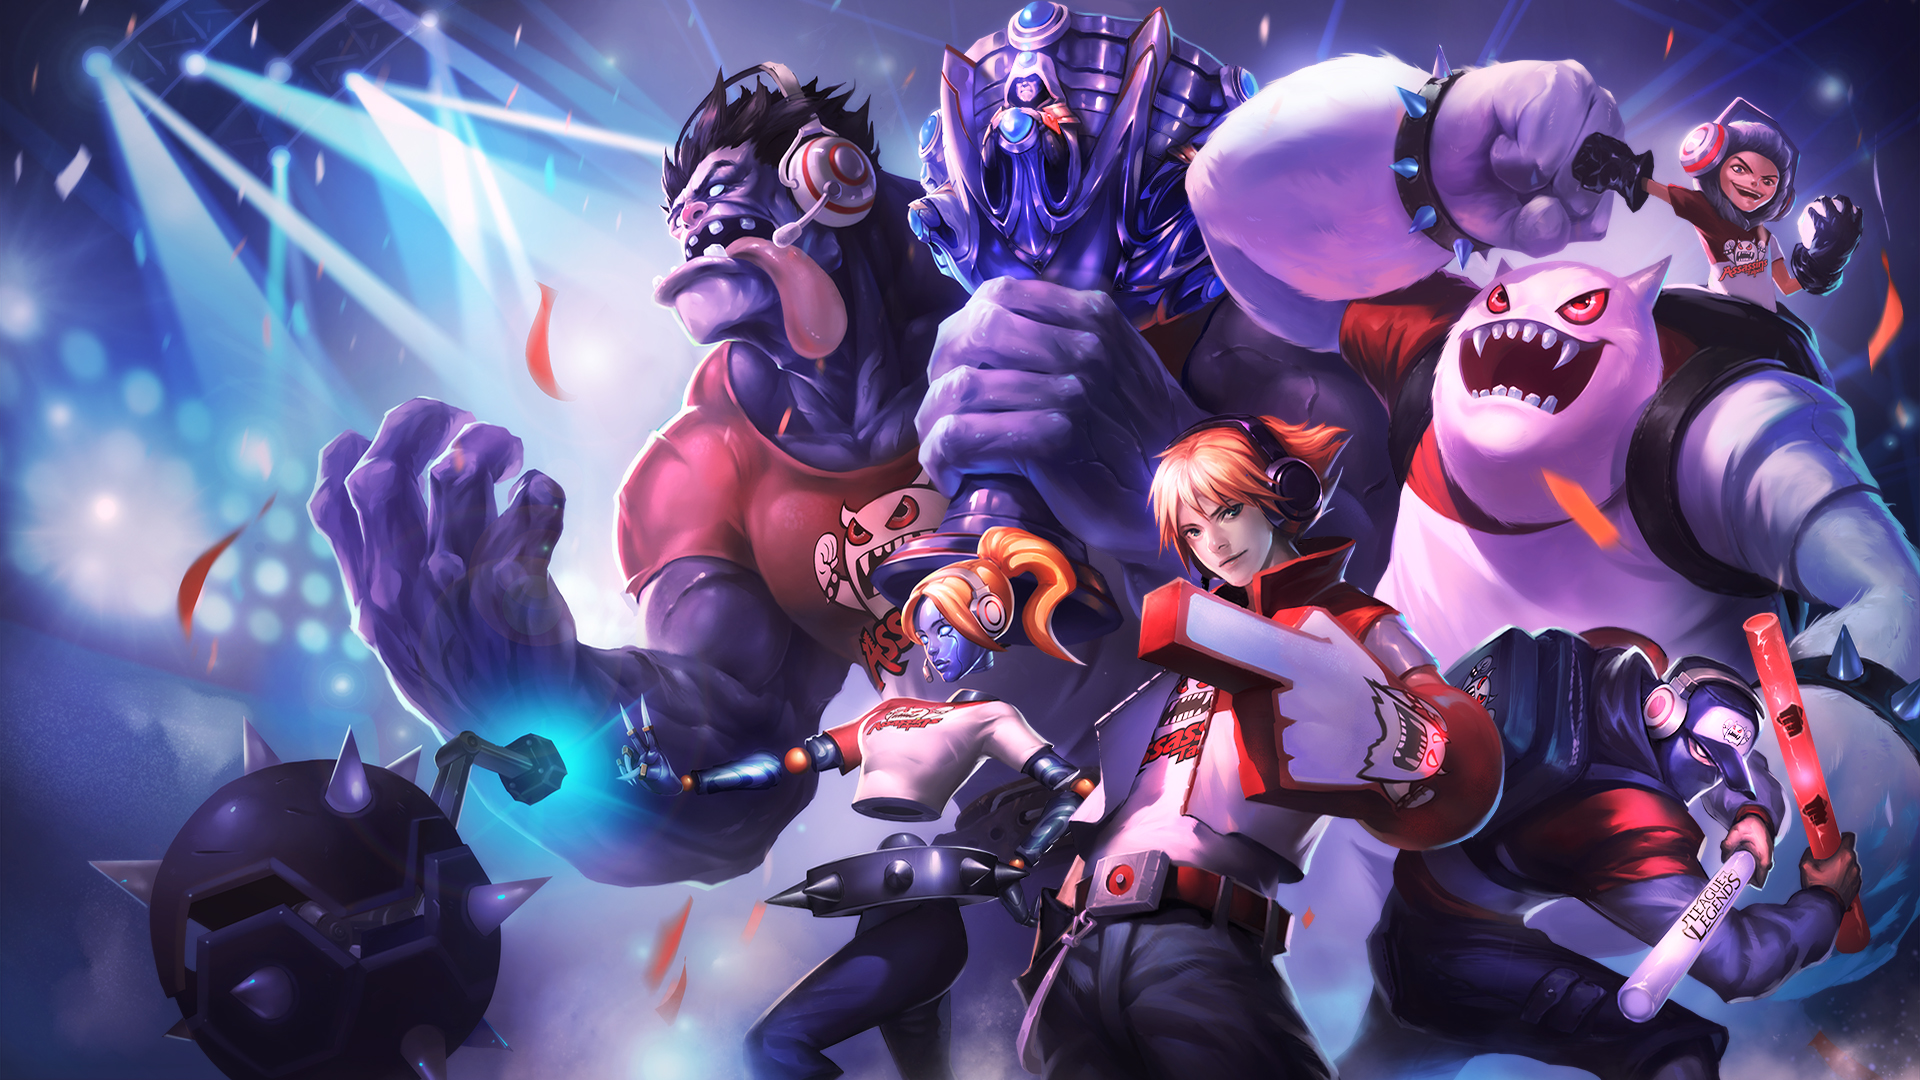 Riot Games announces Taipai Assassins skins for 'League of Legends'